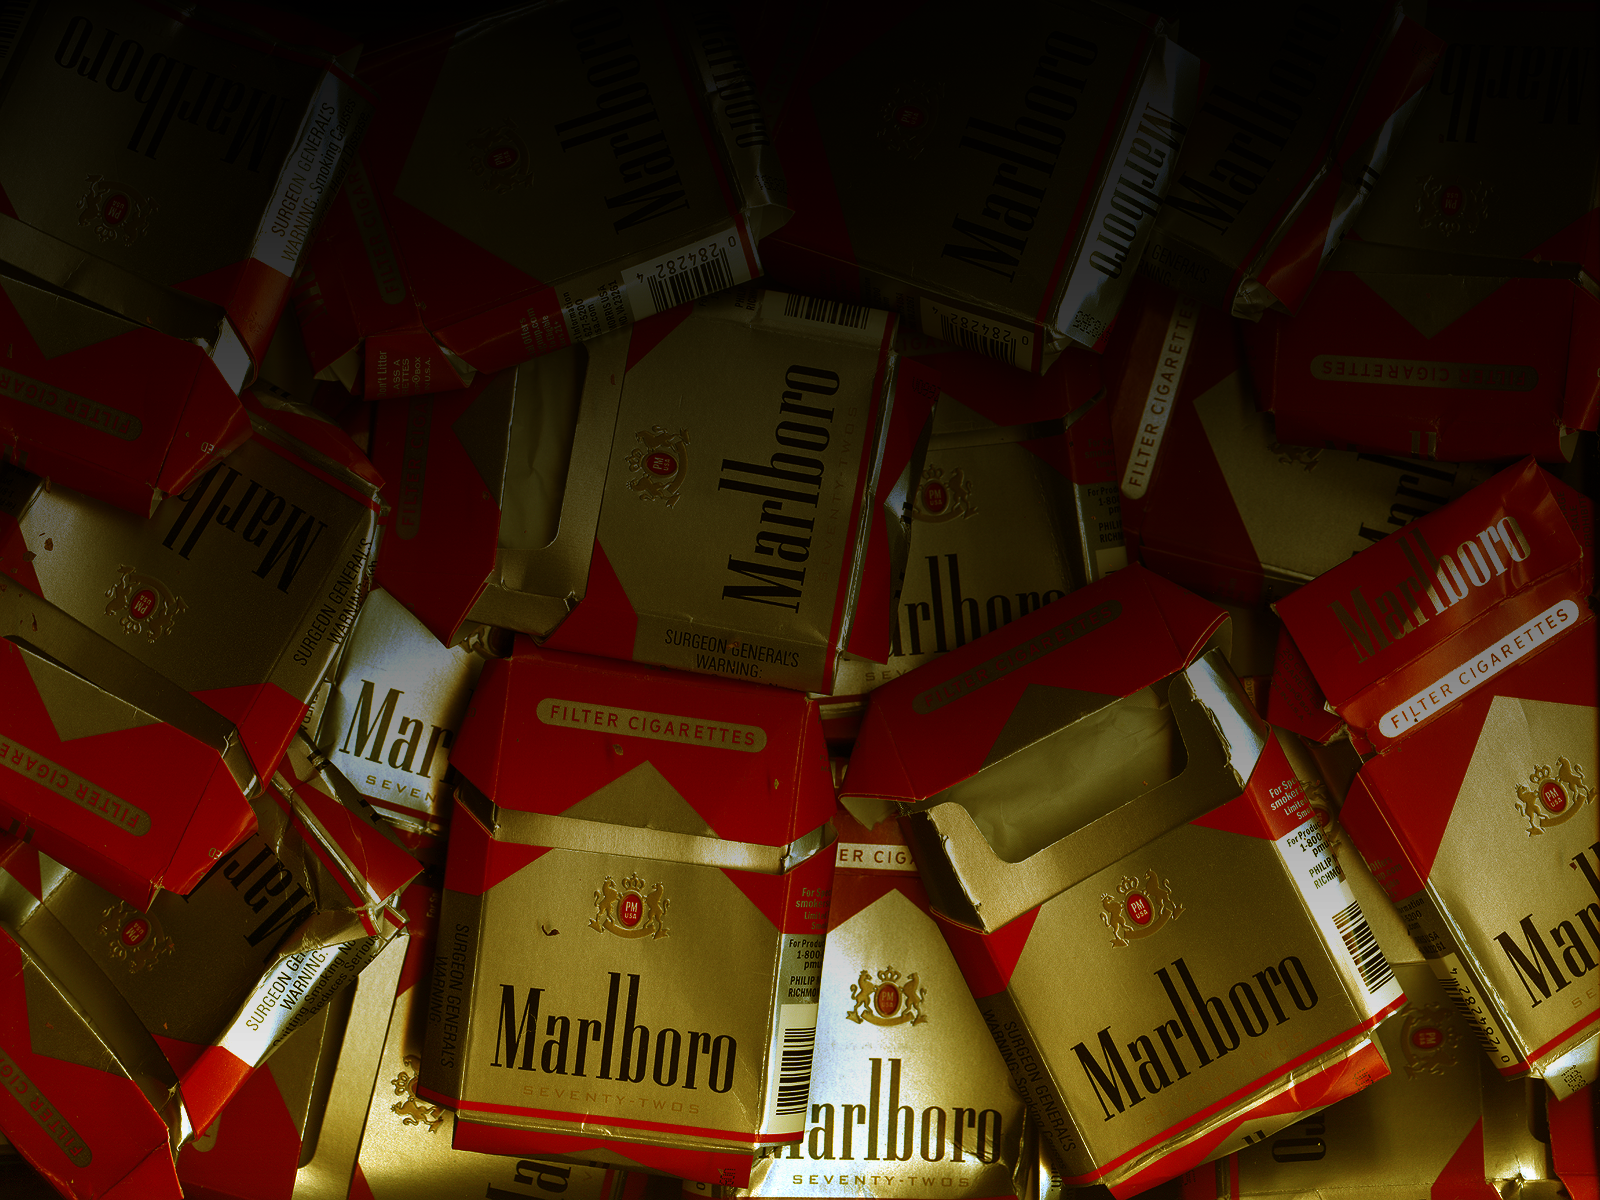 Marlboro Smokes Wallpaper 1600x1200 Marlboro Smokes Havesmoke 1600x1200